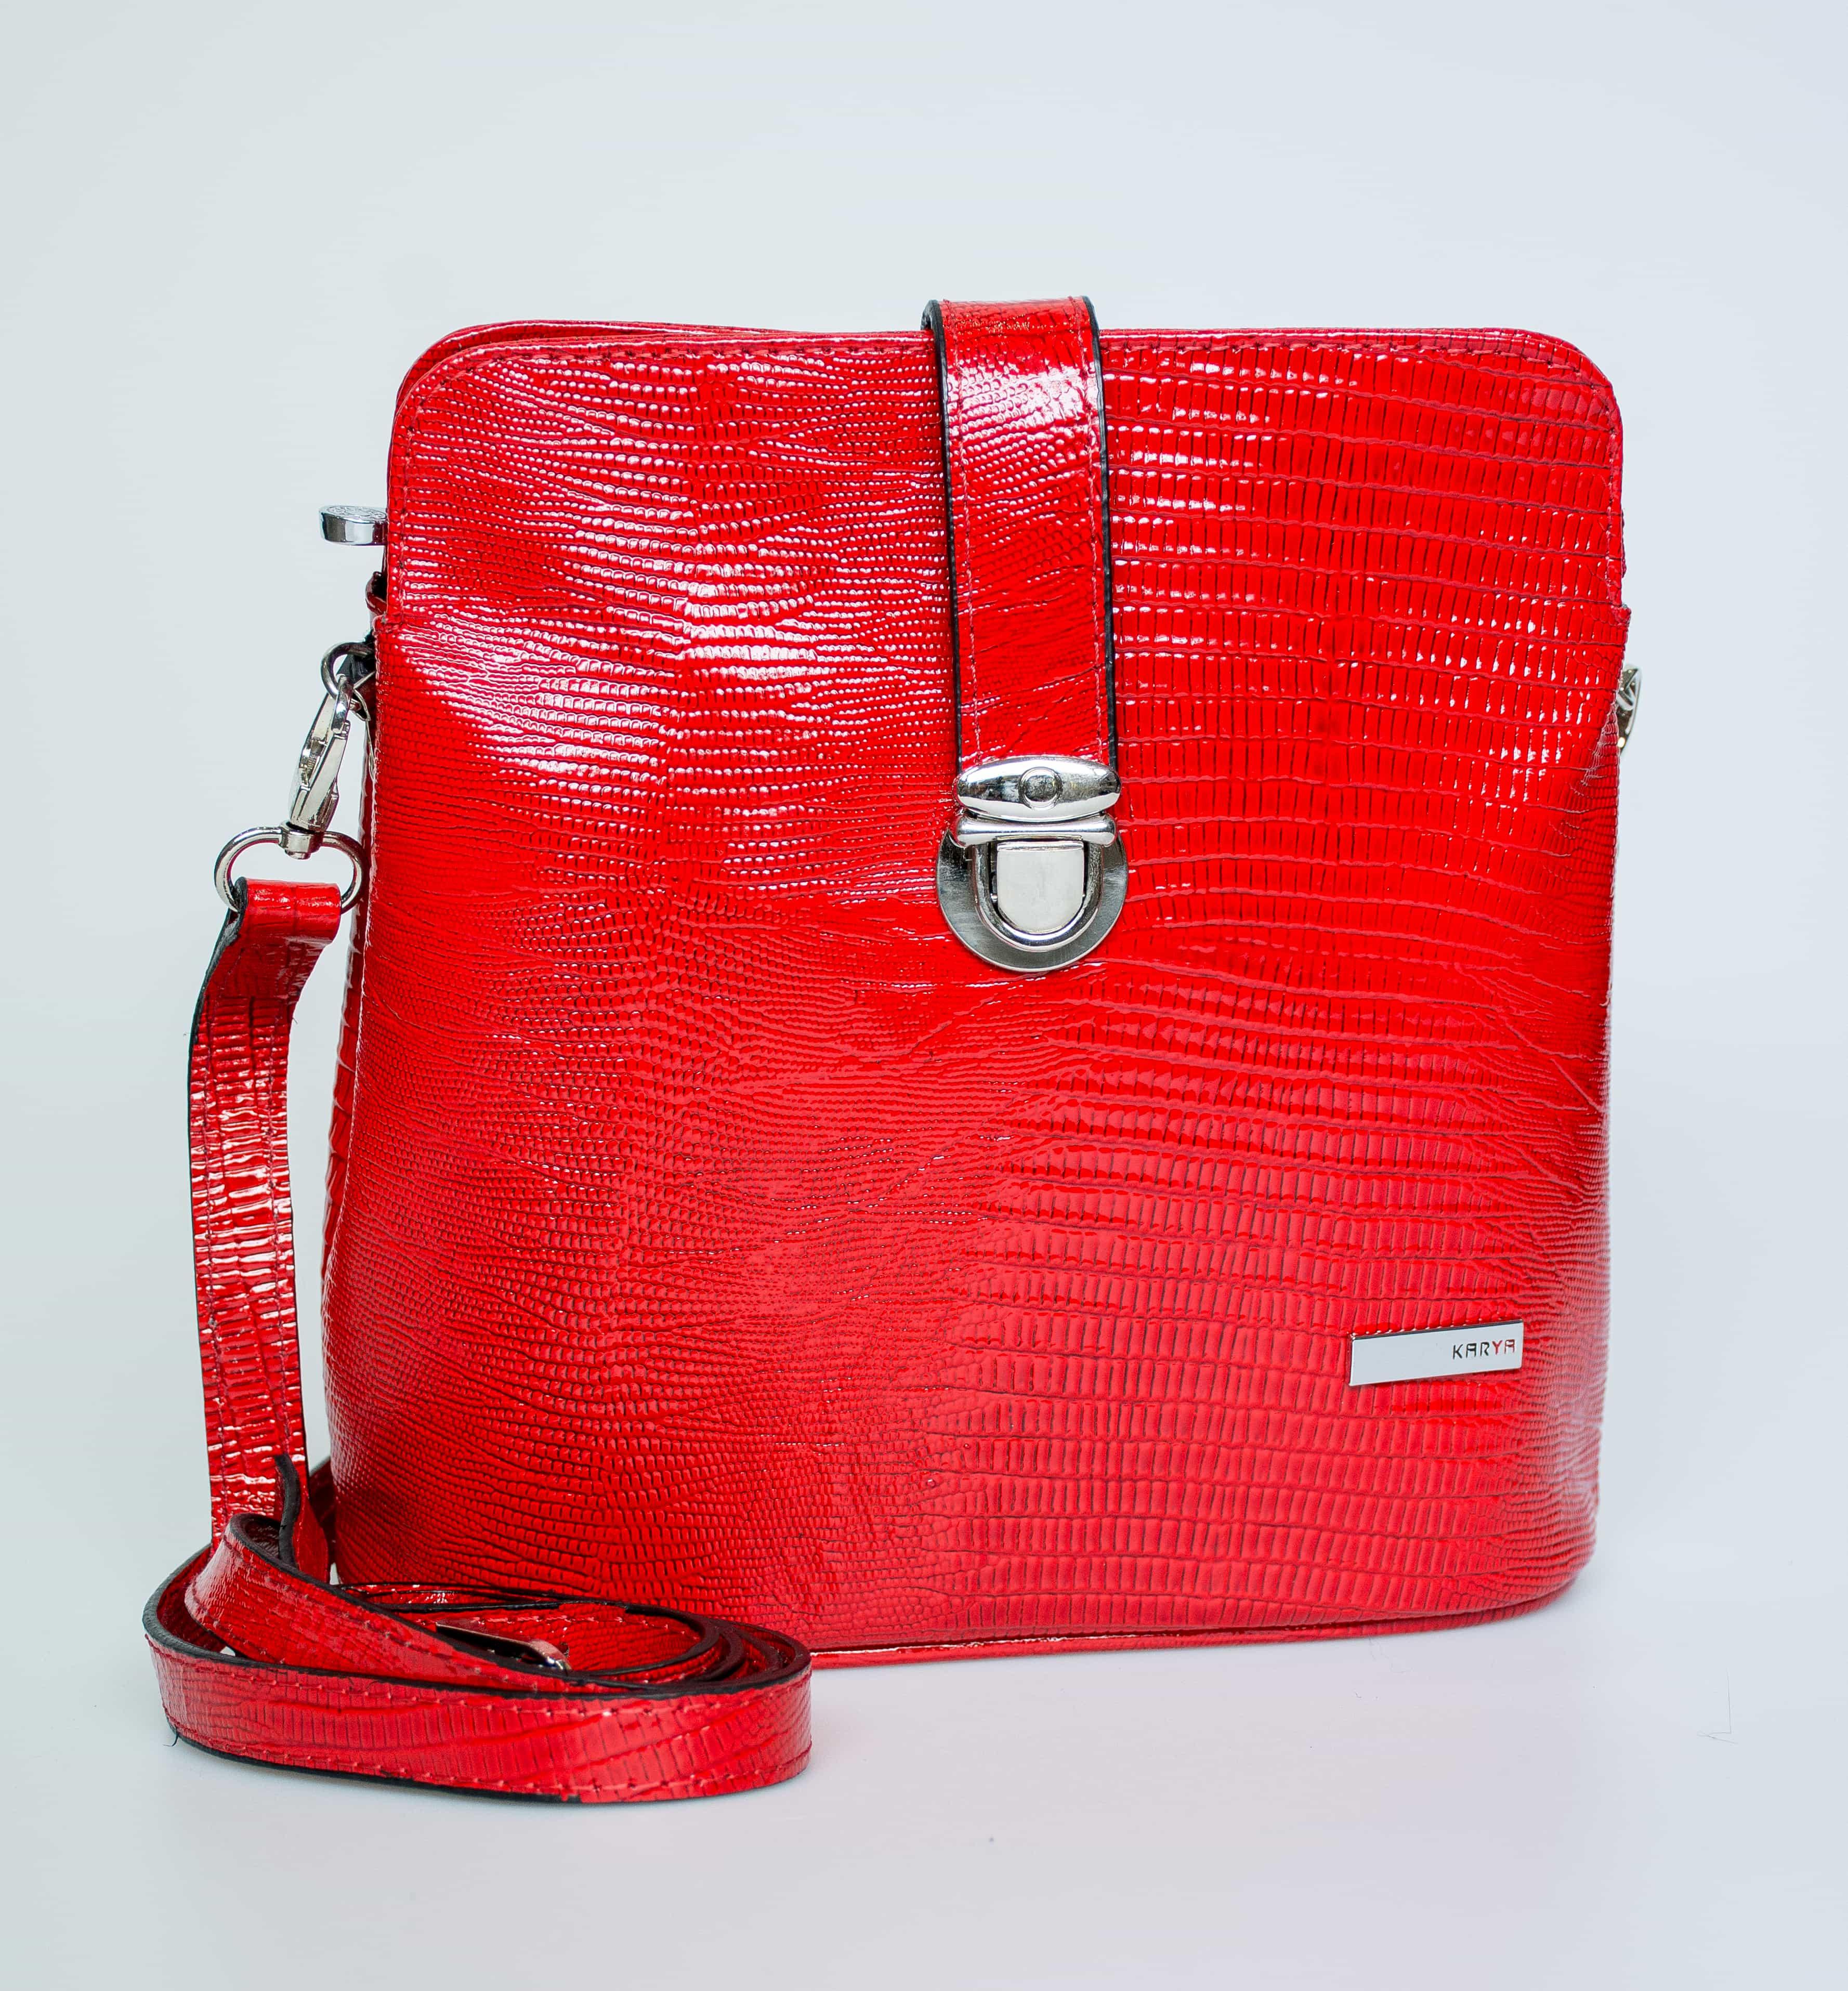 Женская кожаная сумка KARYA. 0380-074